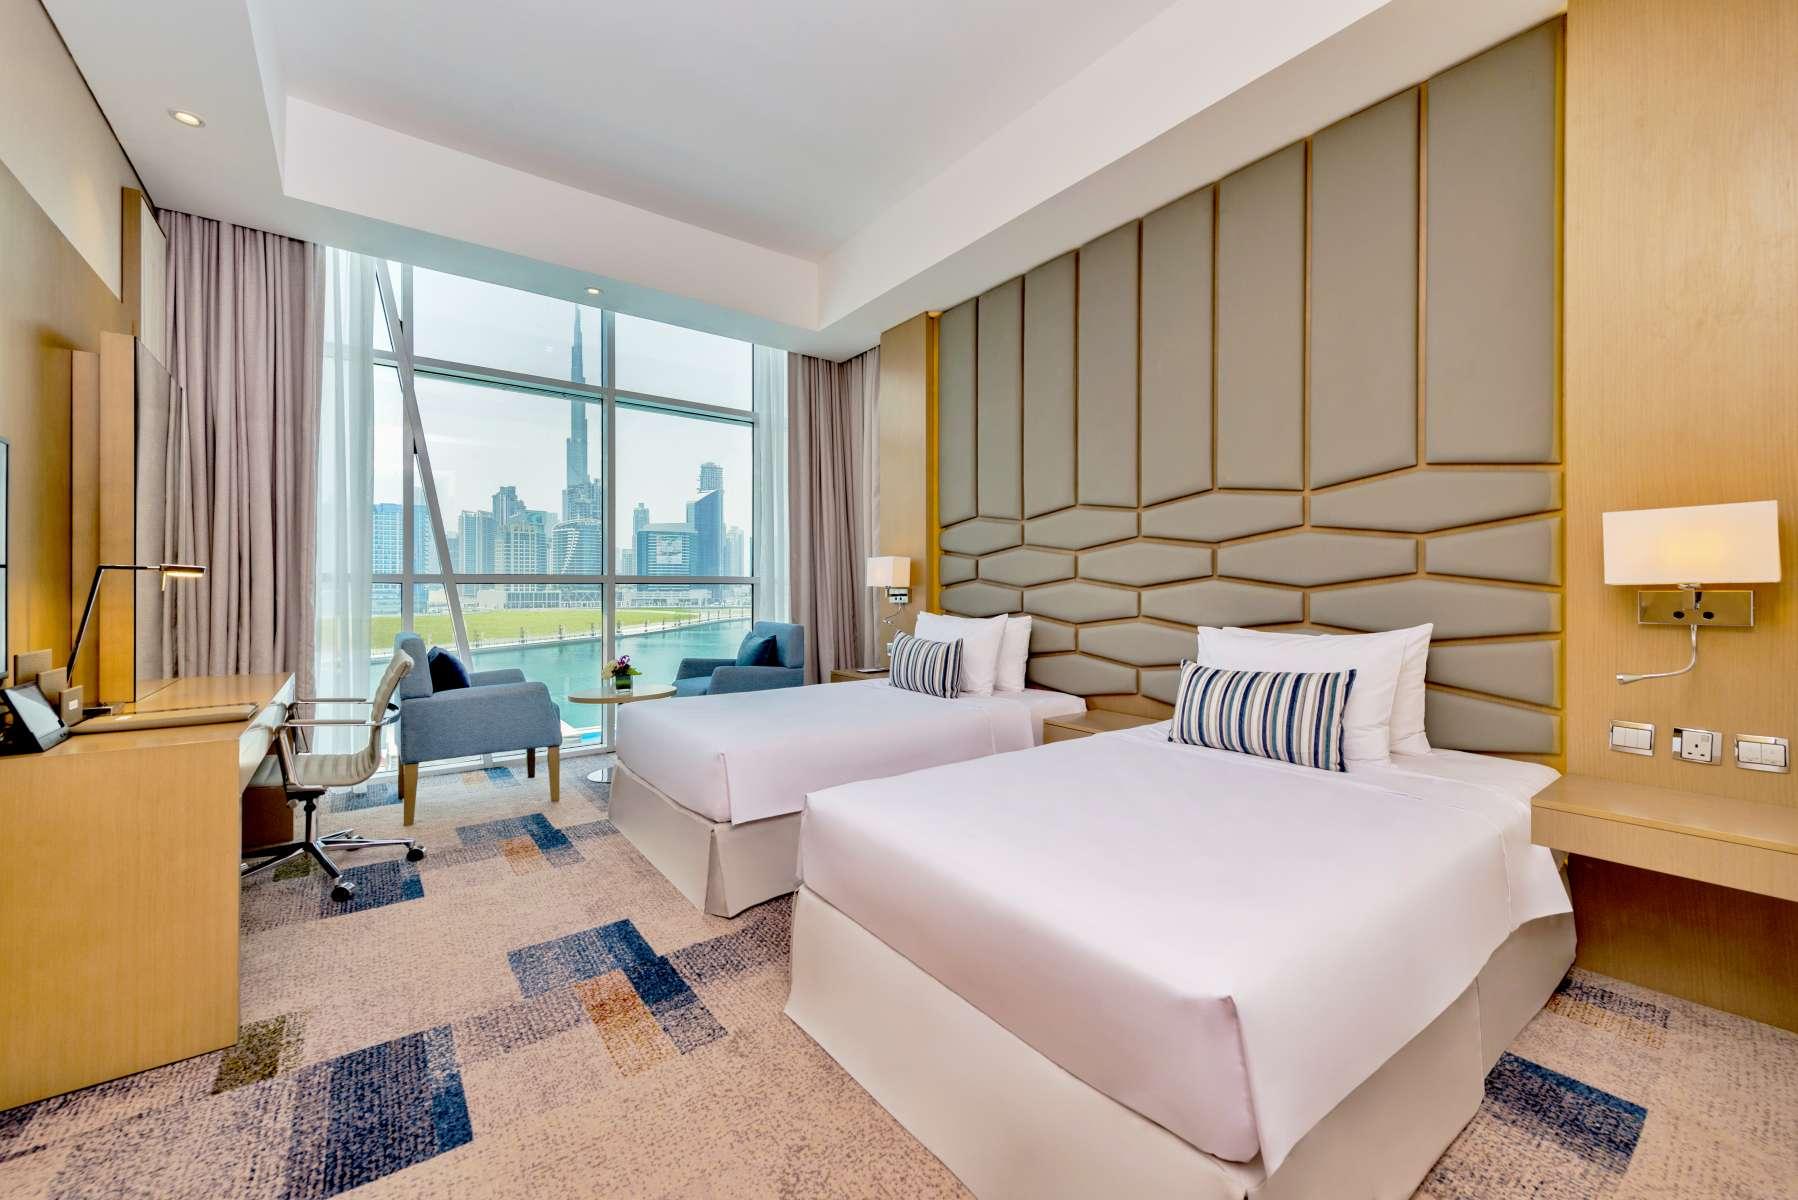 Hotels Near Me Top Hotels In Dubai Hotels In Dubai Best Dubai Hotels Cheap Hotels فنادق دبي